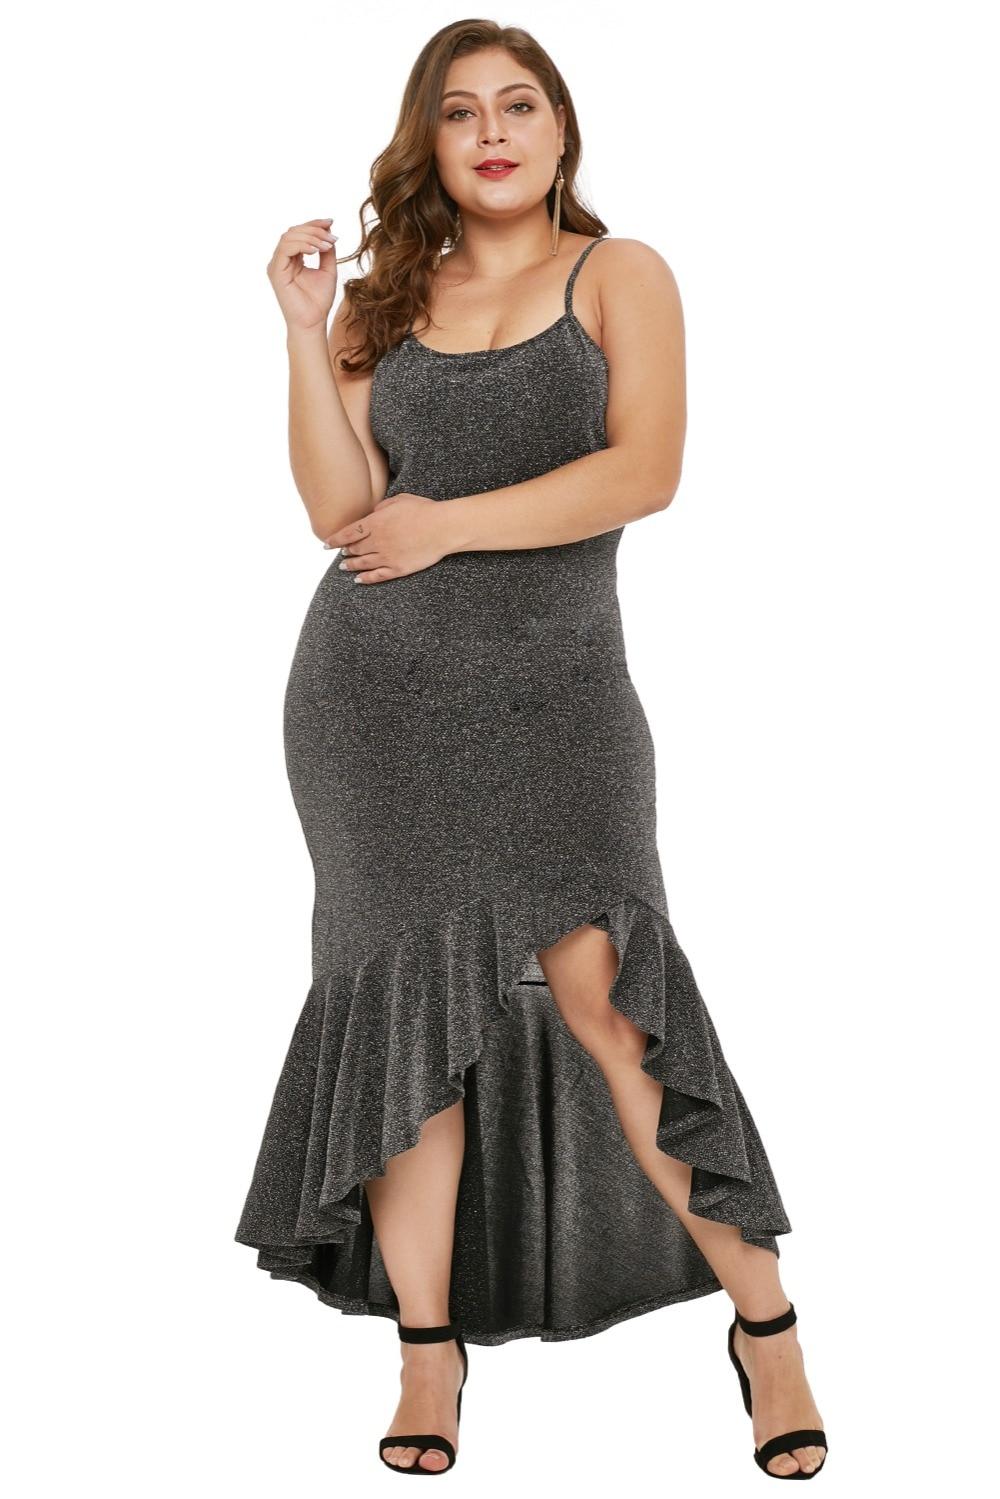 Charcoal-True-Shine-Plus-Size-High-low-Dress-LC610939-13-5